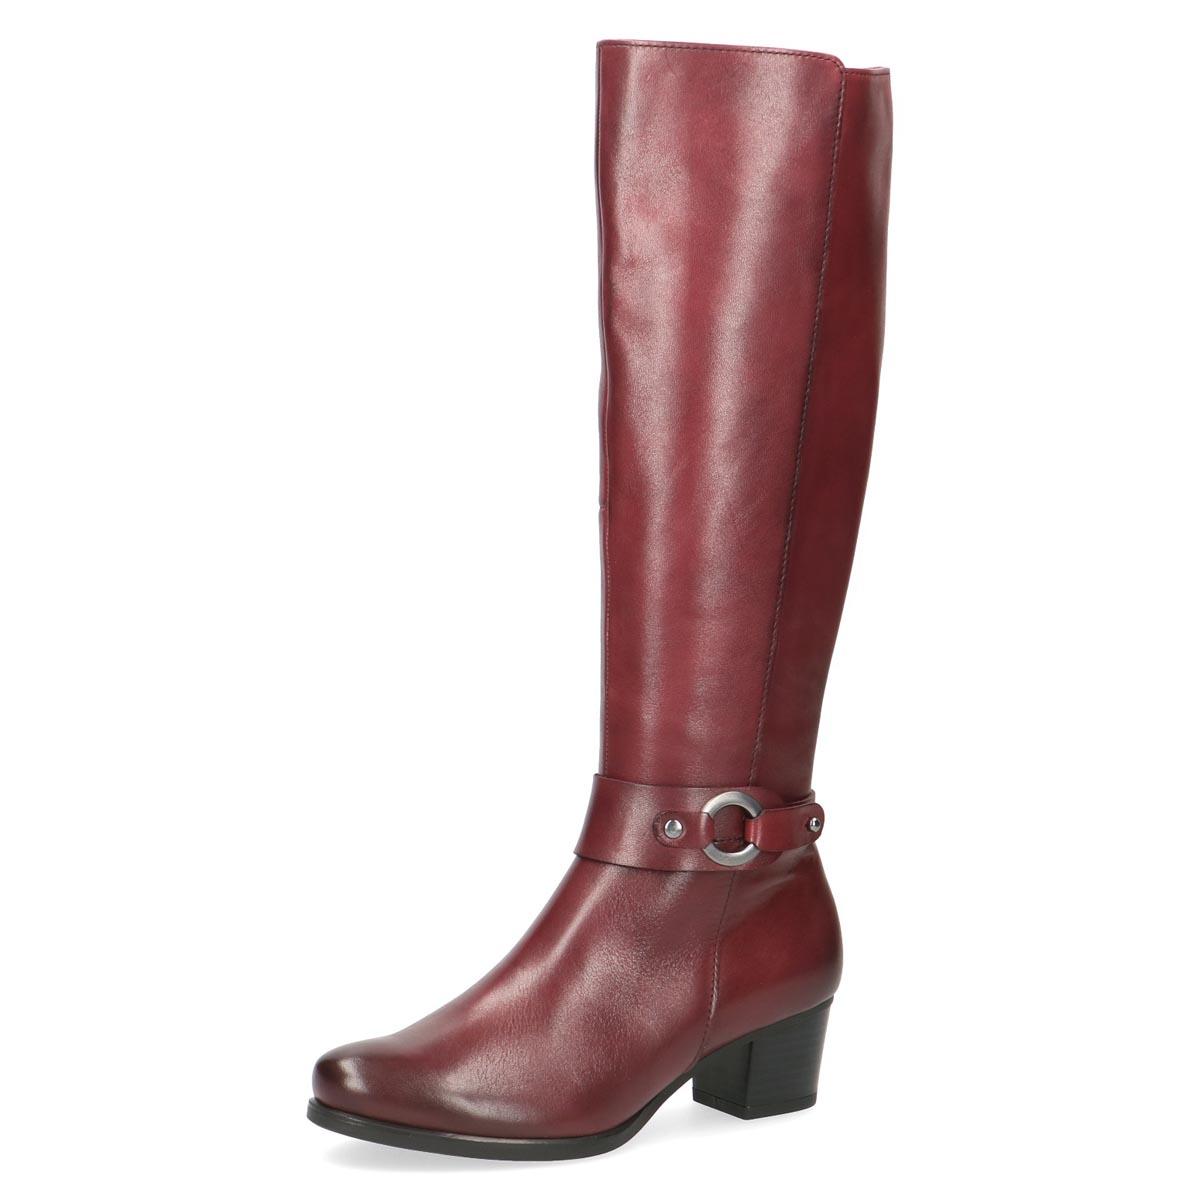 Caprice - Frieda Burgundy Leather Long Boot